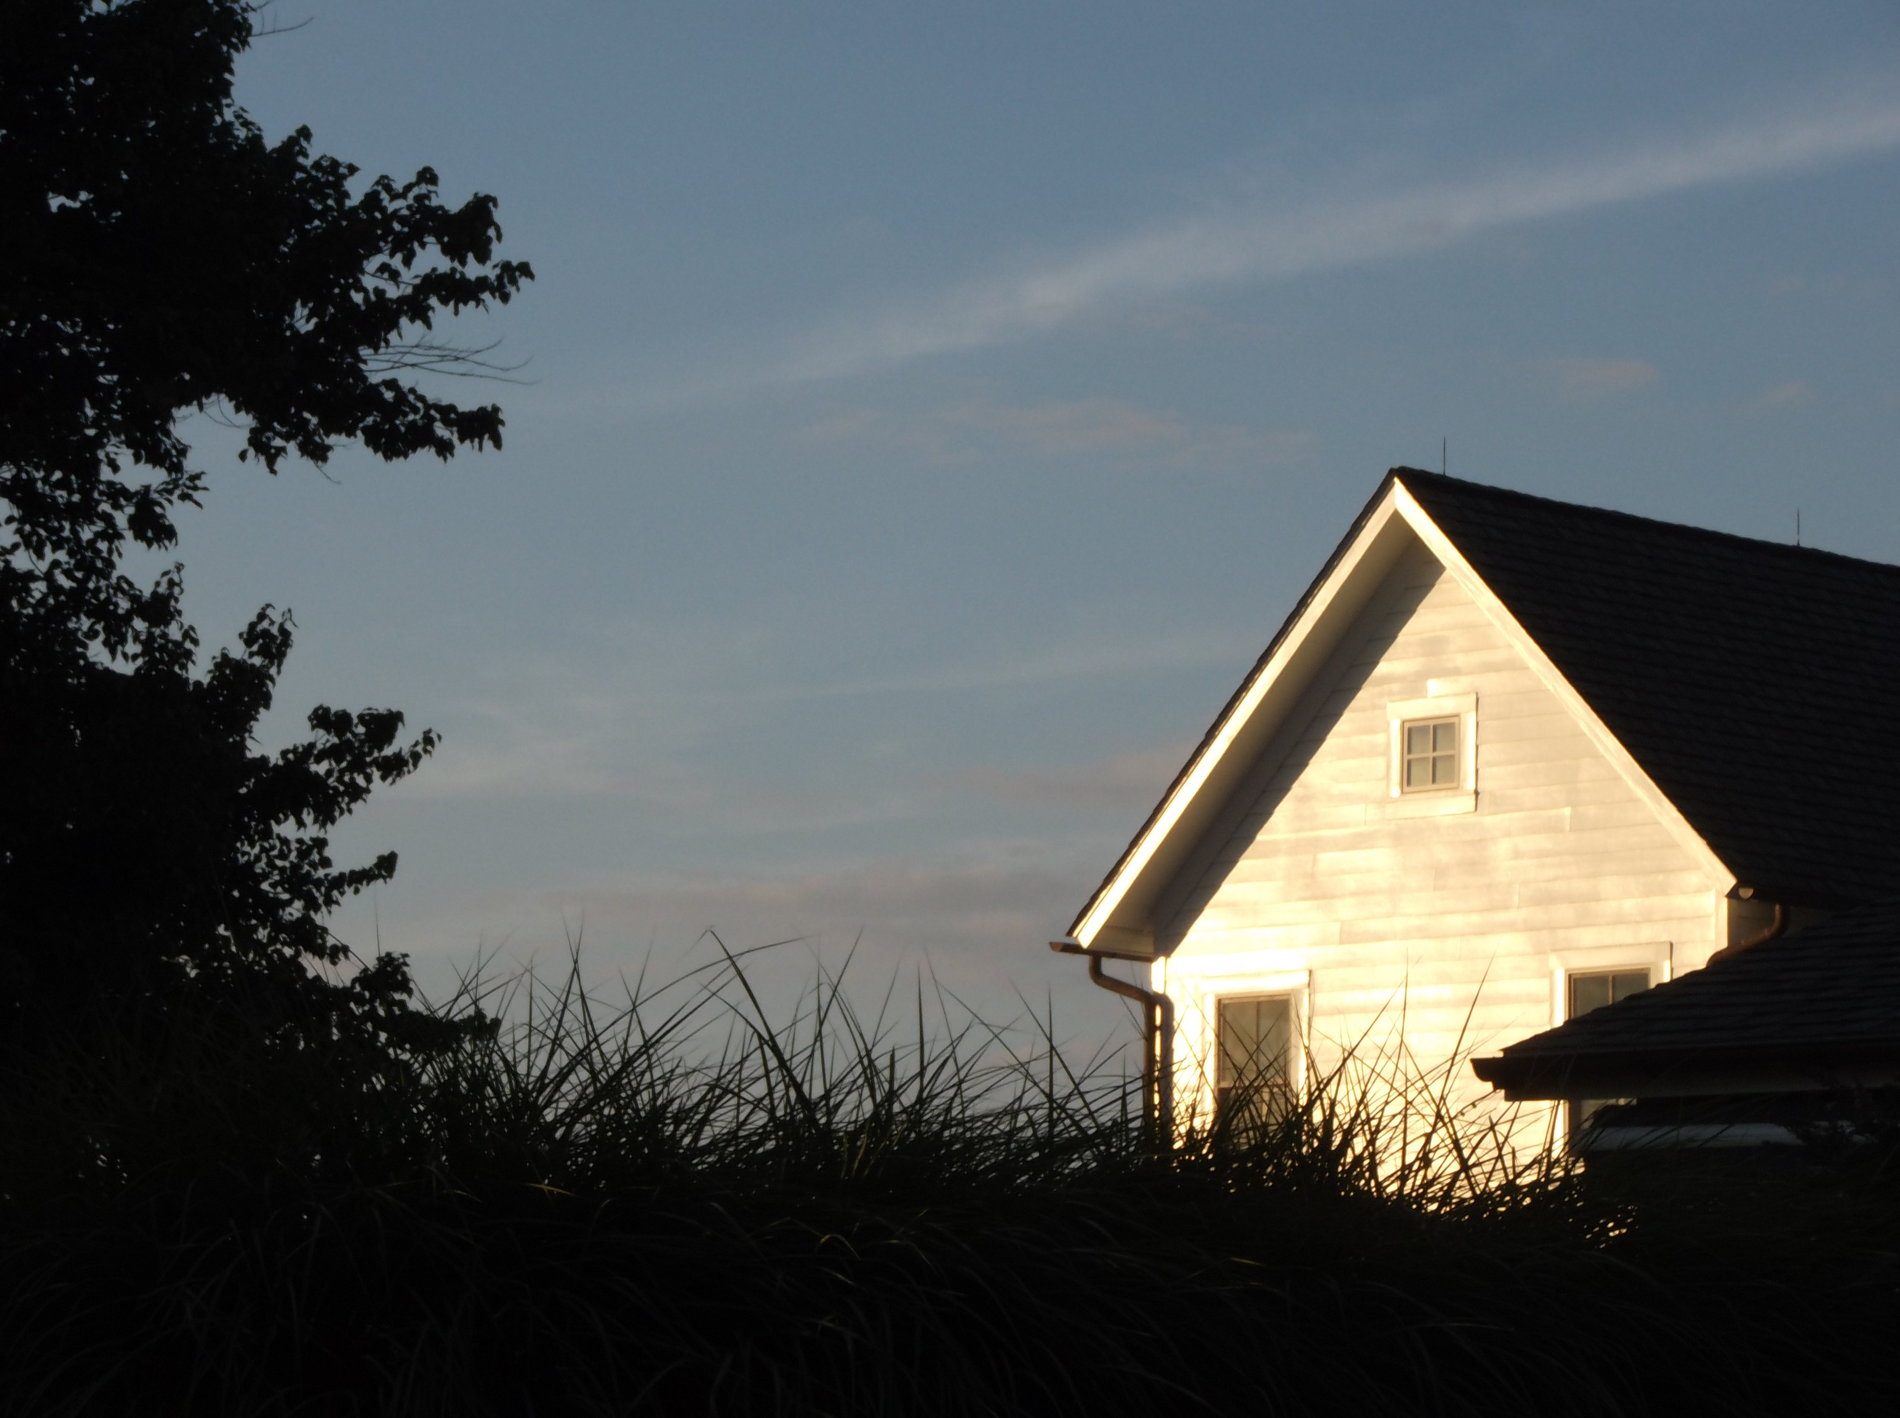 House with sun and sky